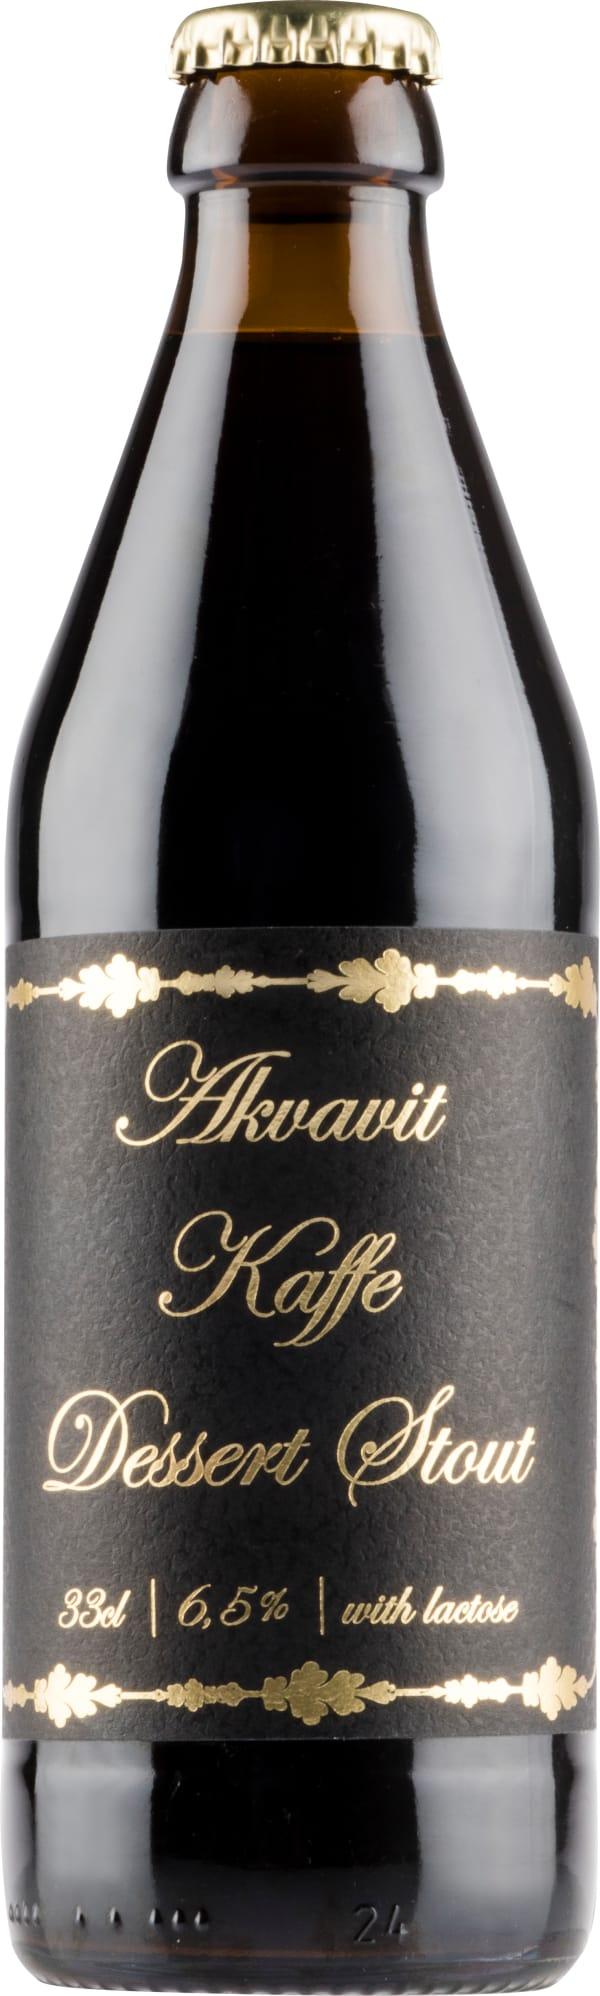 Fiskarsin Akvavit Kaffe Stout